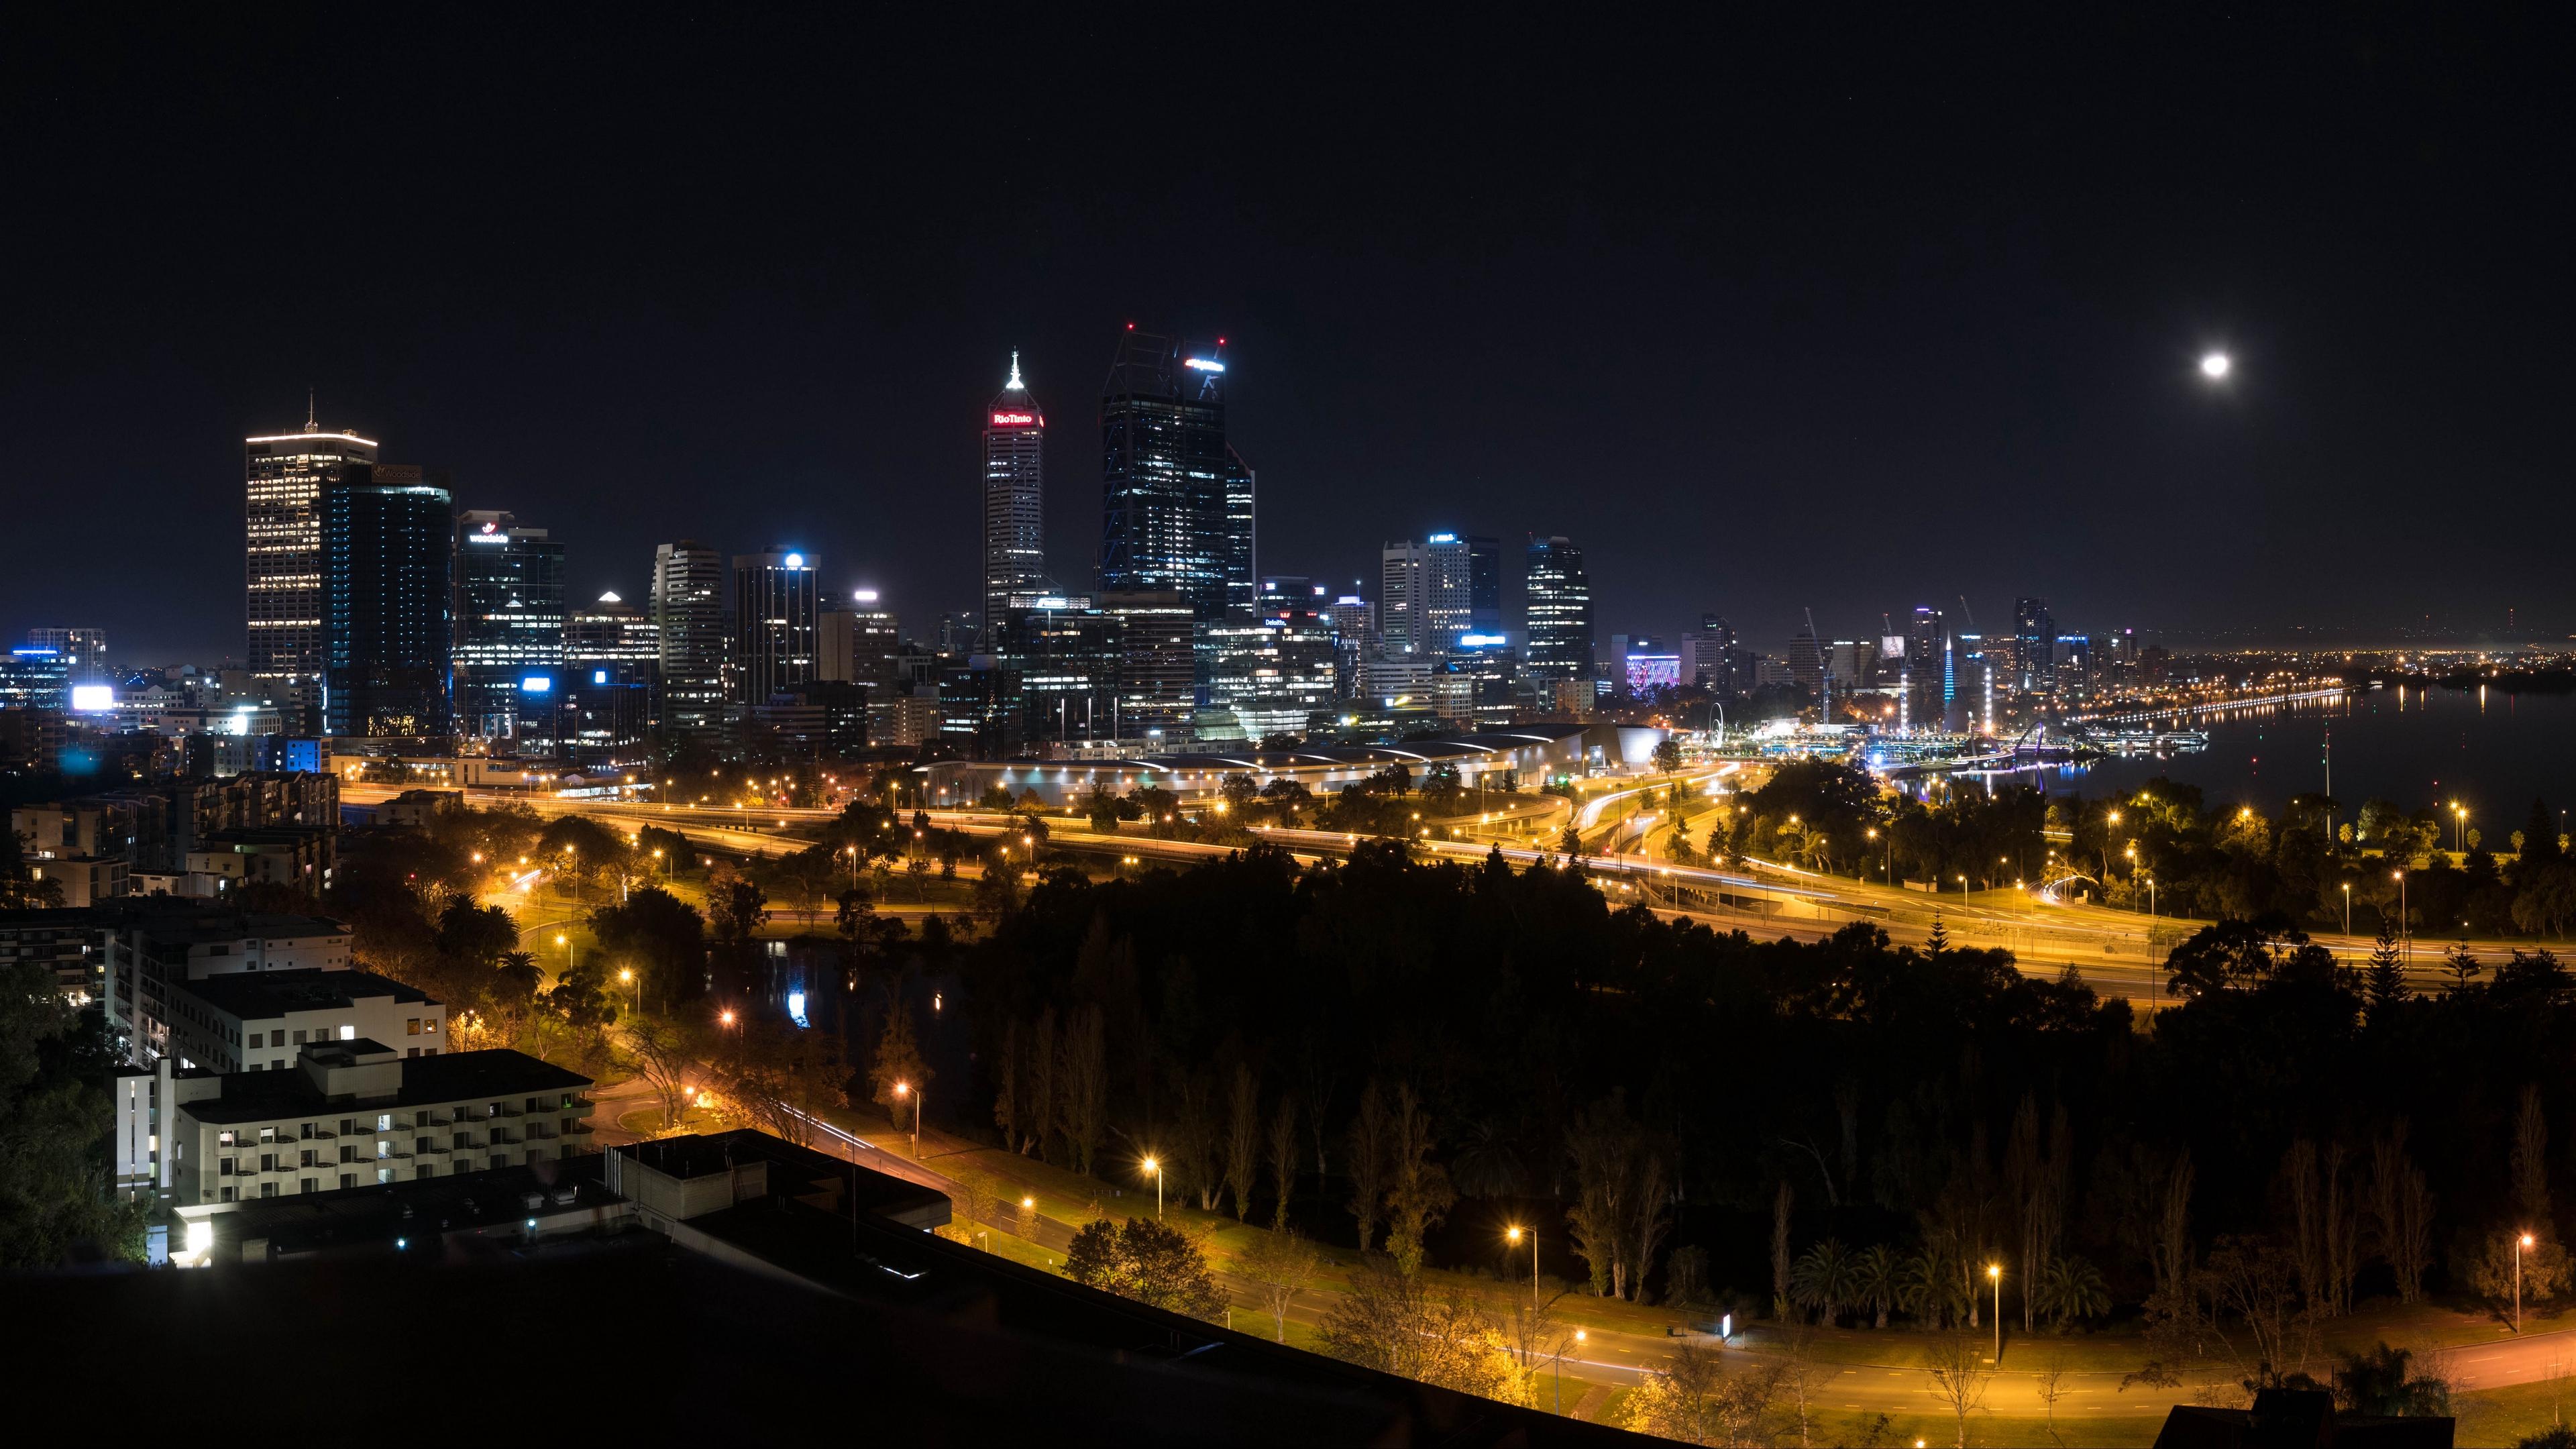 night city skyscrapers buildings city lights perth australia 4k 1538067522 - night city, skyscrapers, buildings, city lights, perth, australia 4k - Skyscrapers, night city, buildings